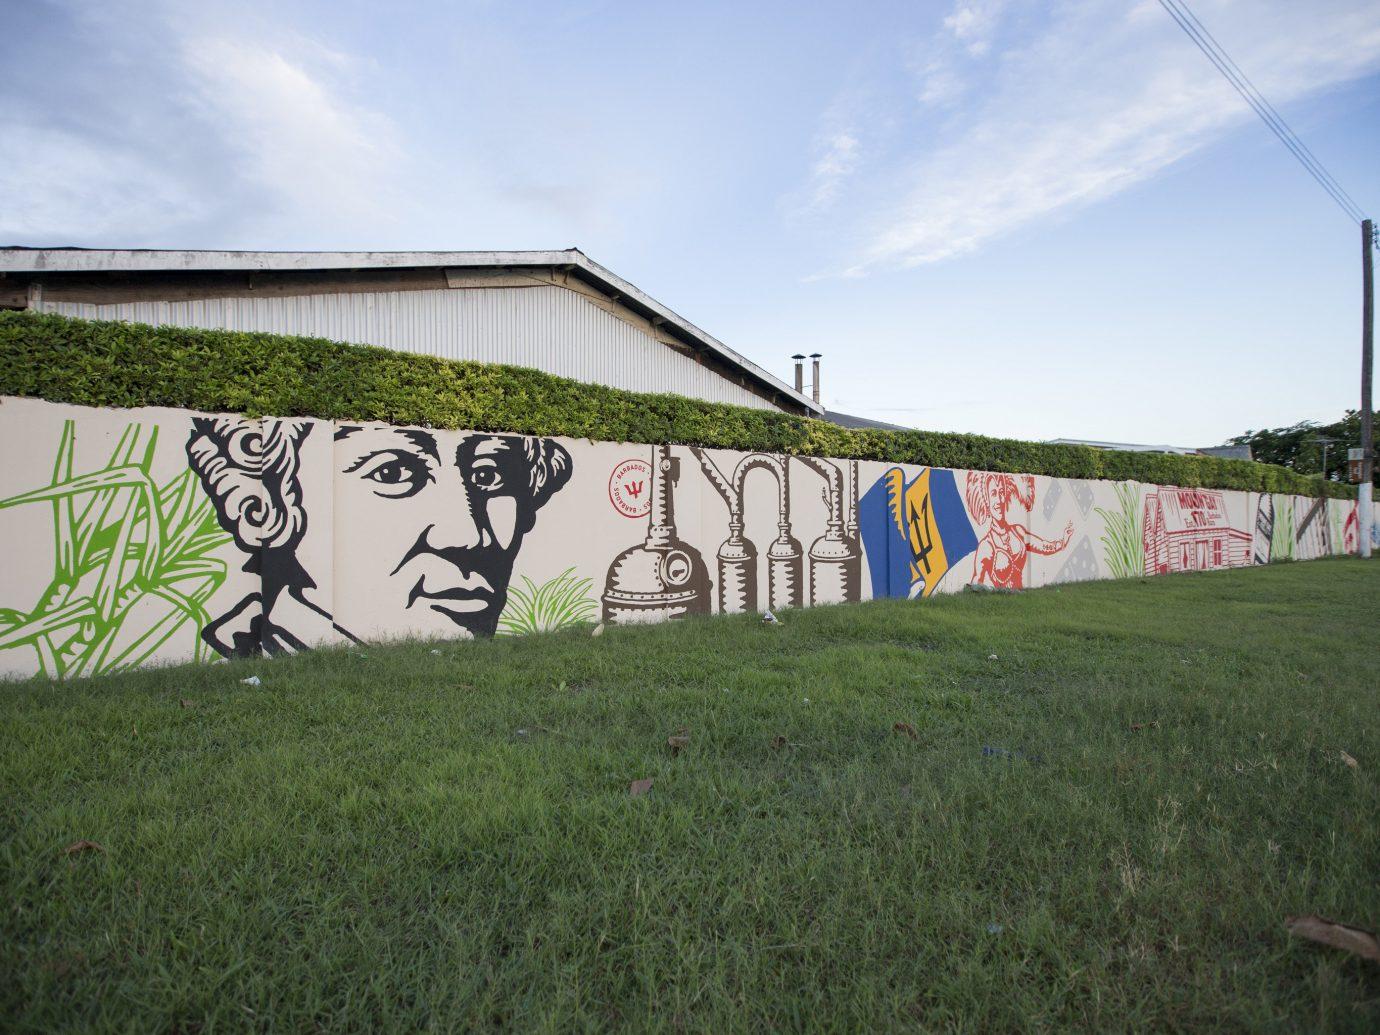 Trip Ideas grass sky outdoor field urban area wall art graffiti grassy mural stadium outdoor object lush day